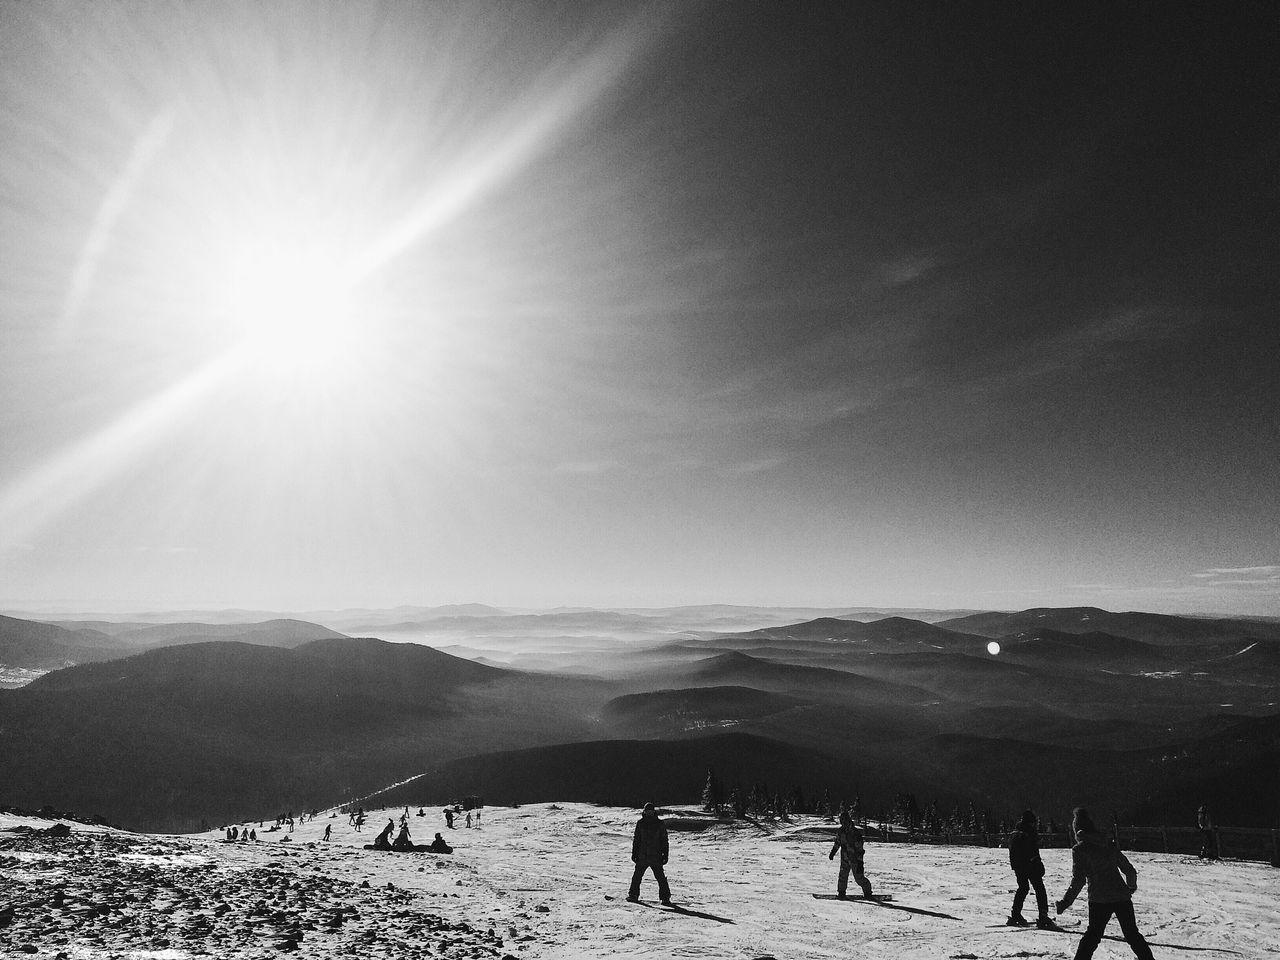 Large Group Of People On Ski Slope